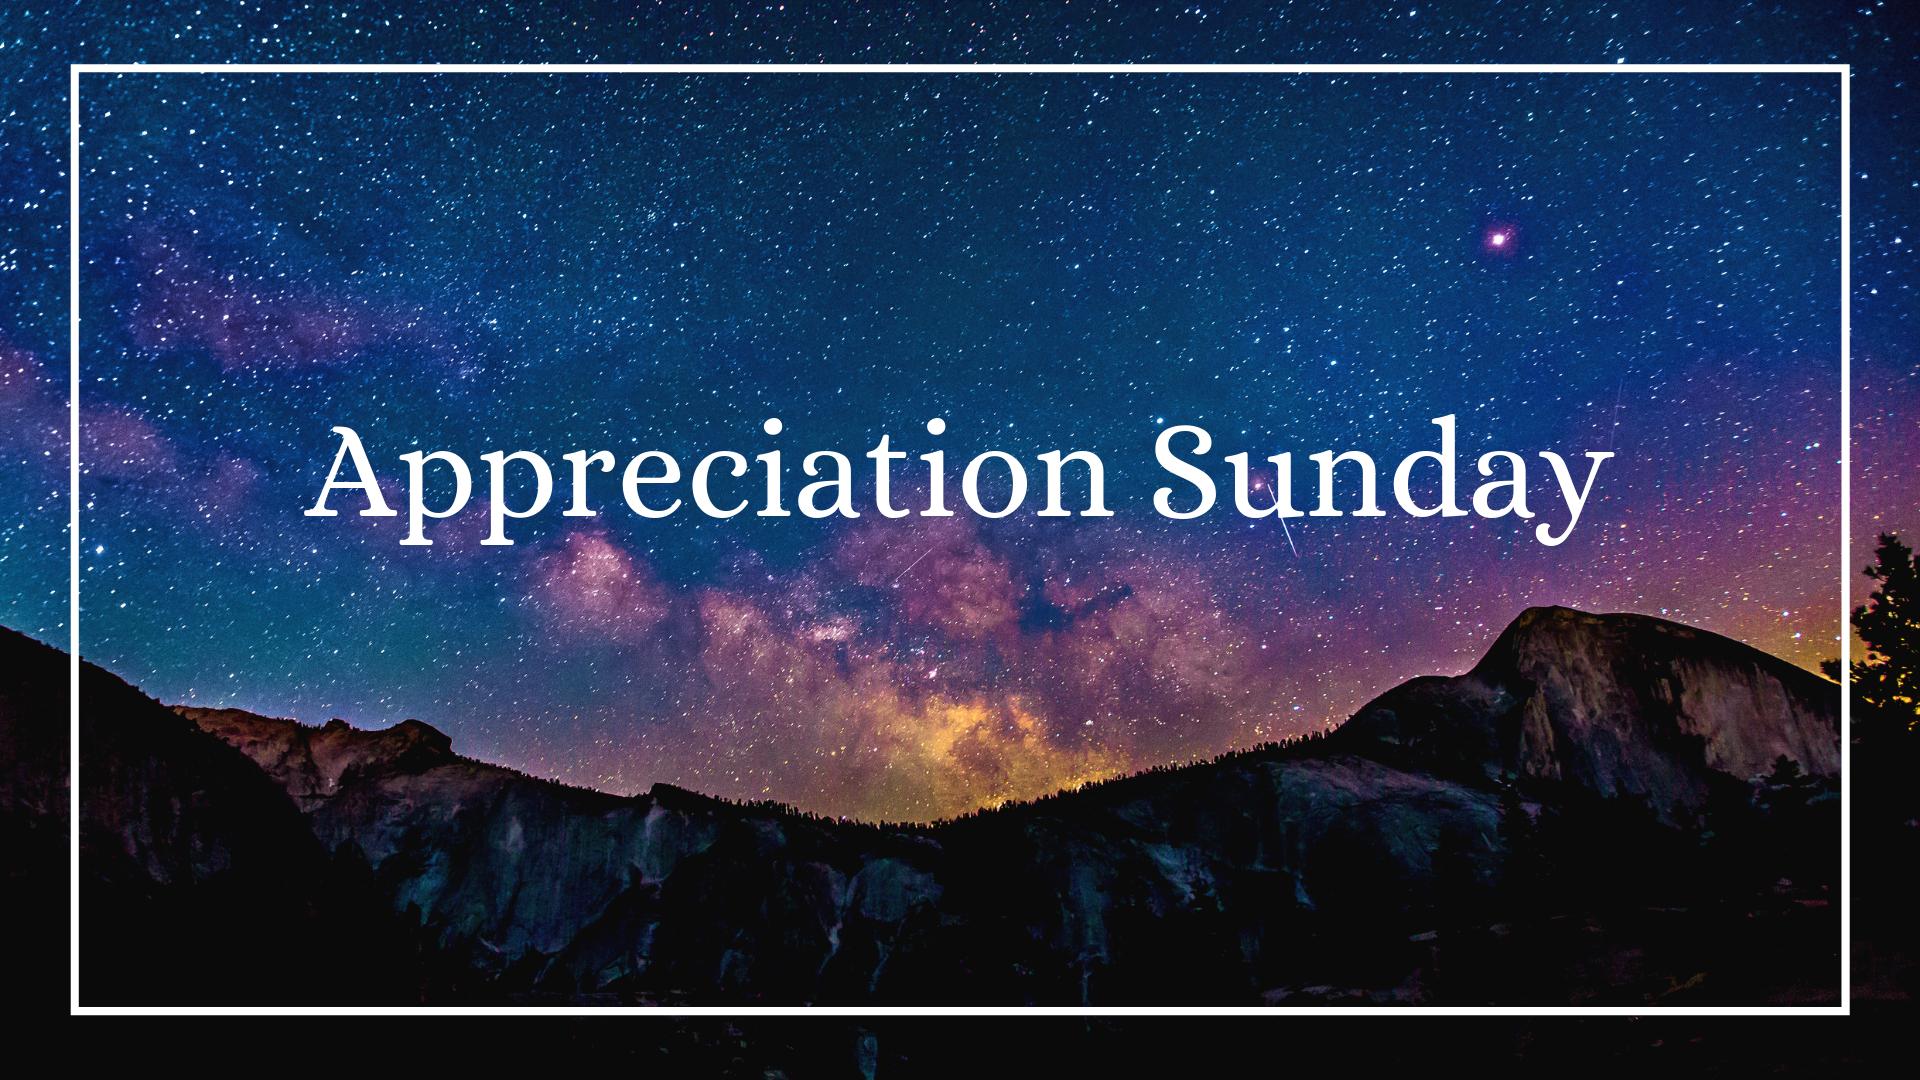 Appreciation Sunday